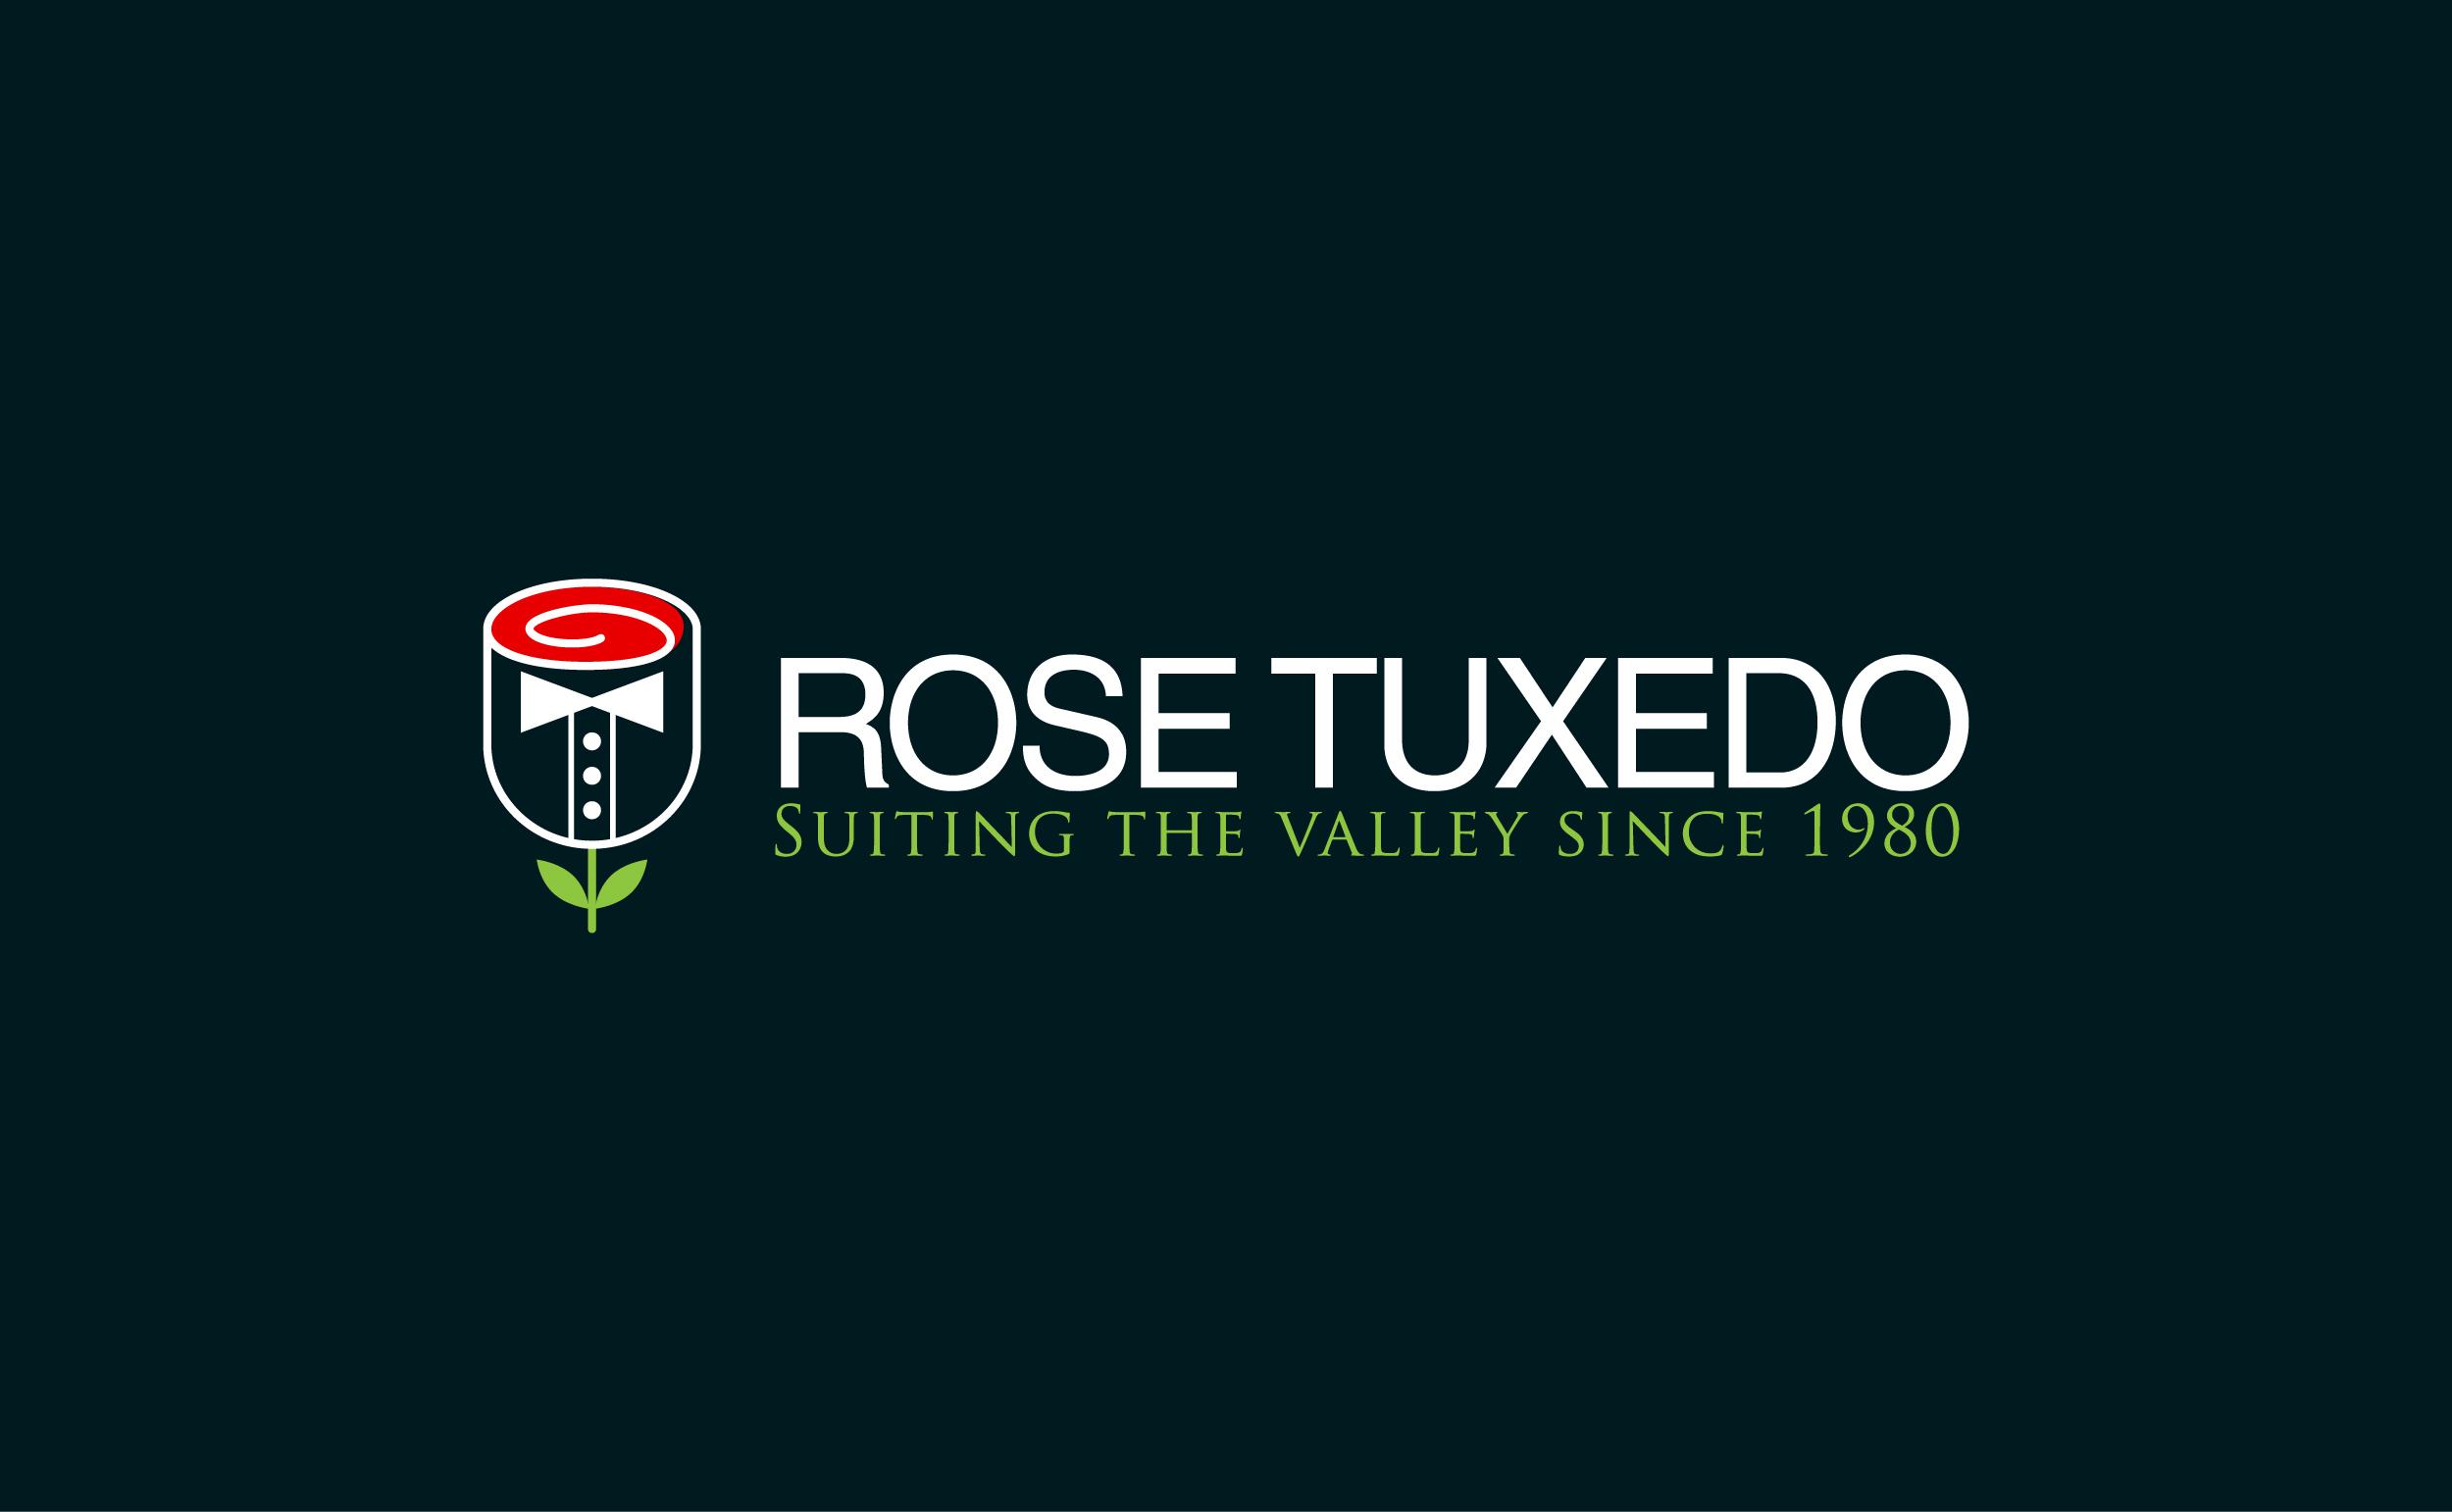 Rose Tuxedo